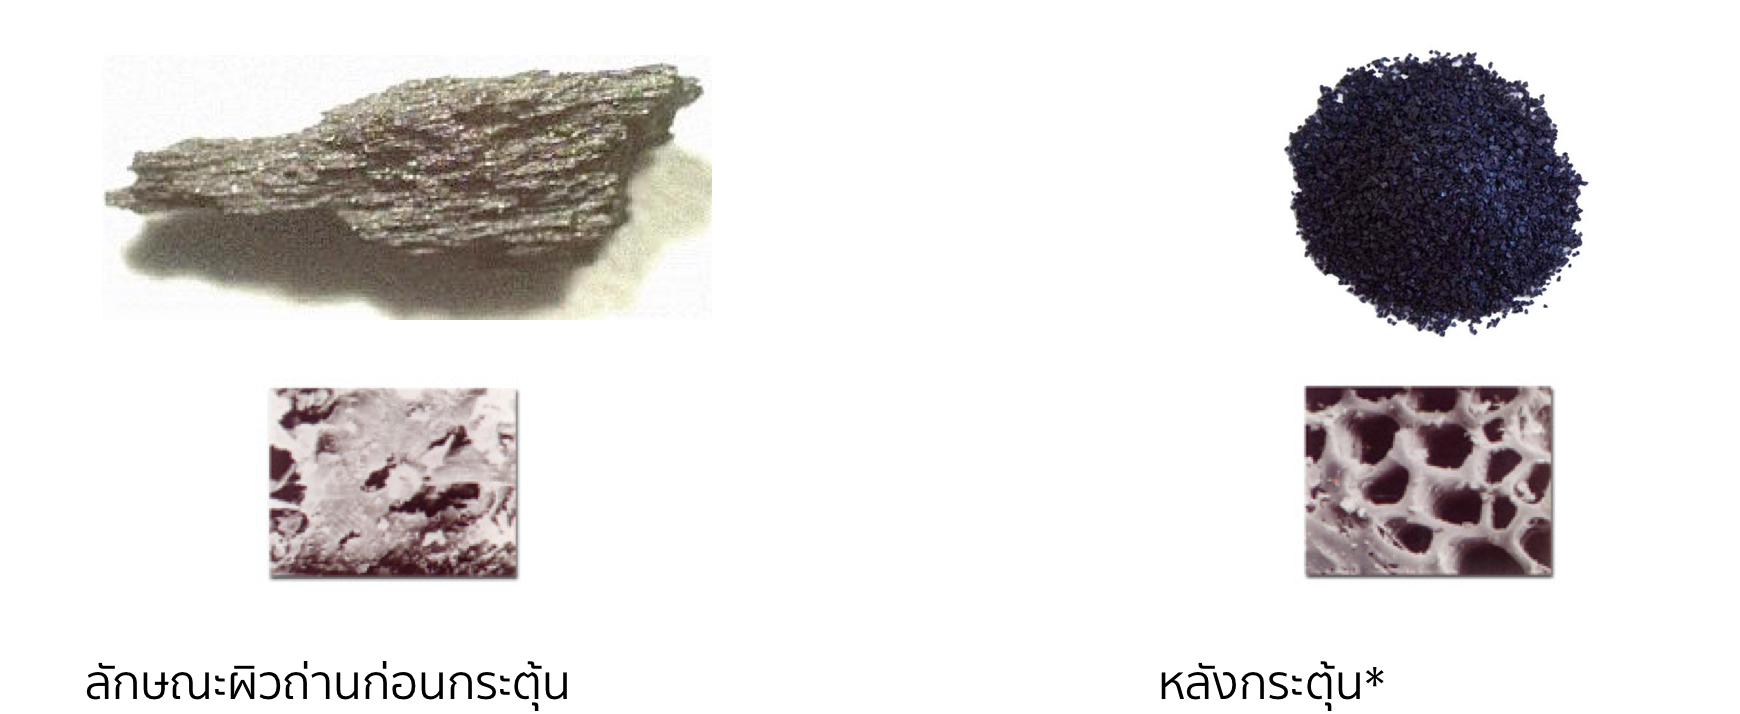 chacoal